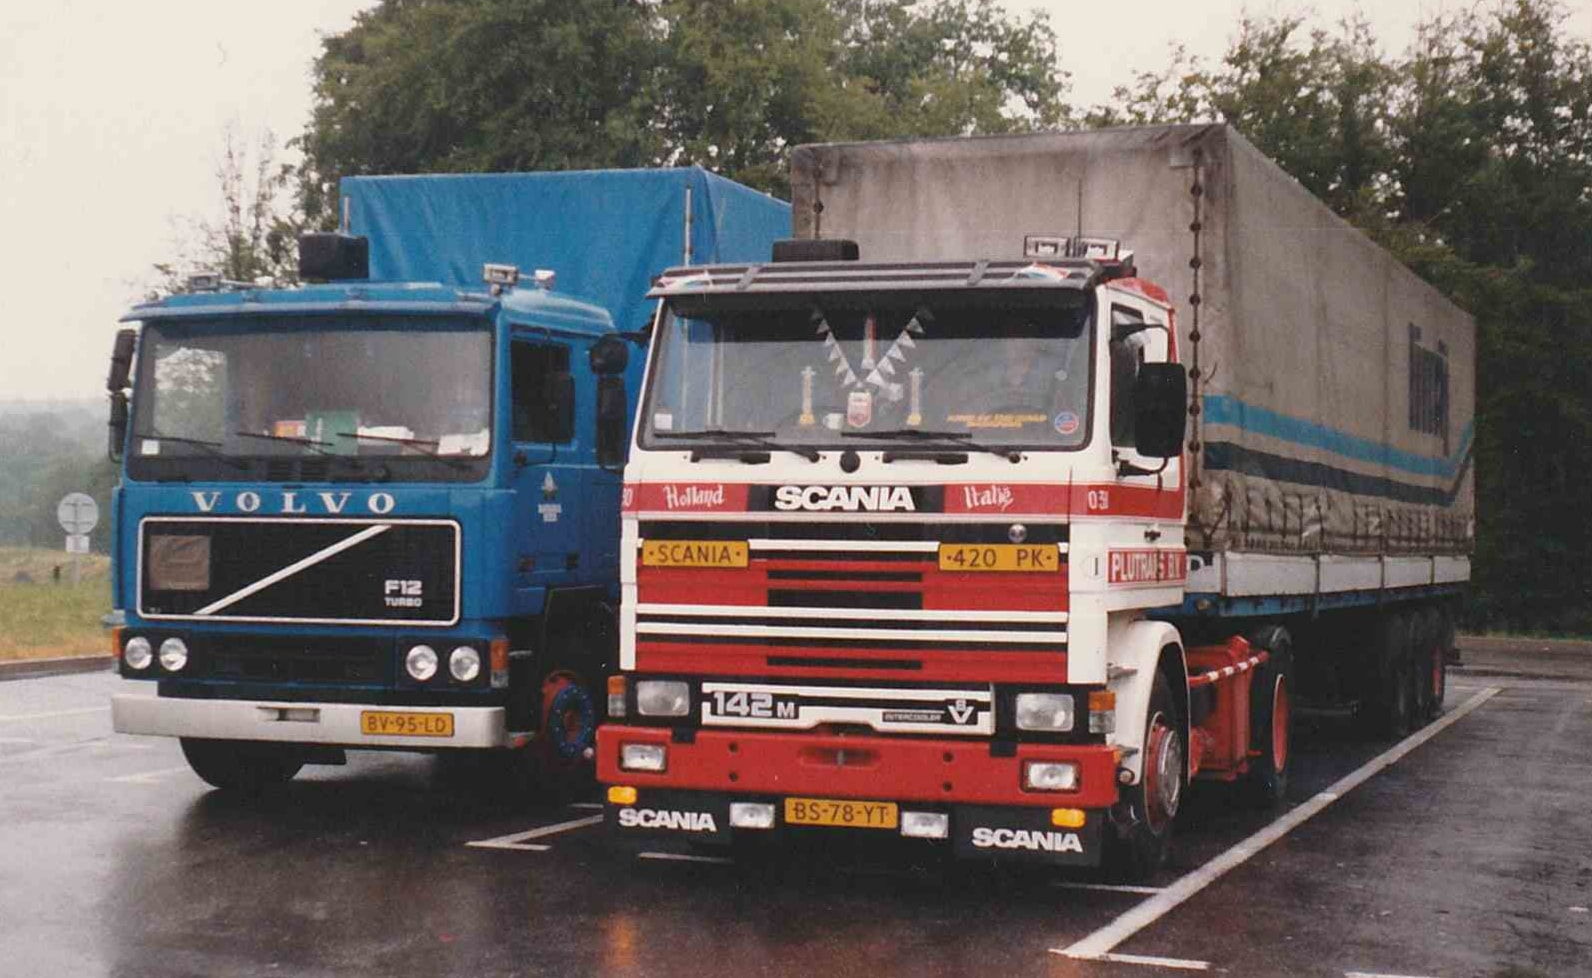 Jan-Michels-met-de-nieuwe-Volvo-in-kleur-van-Bavaria